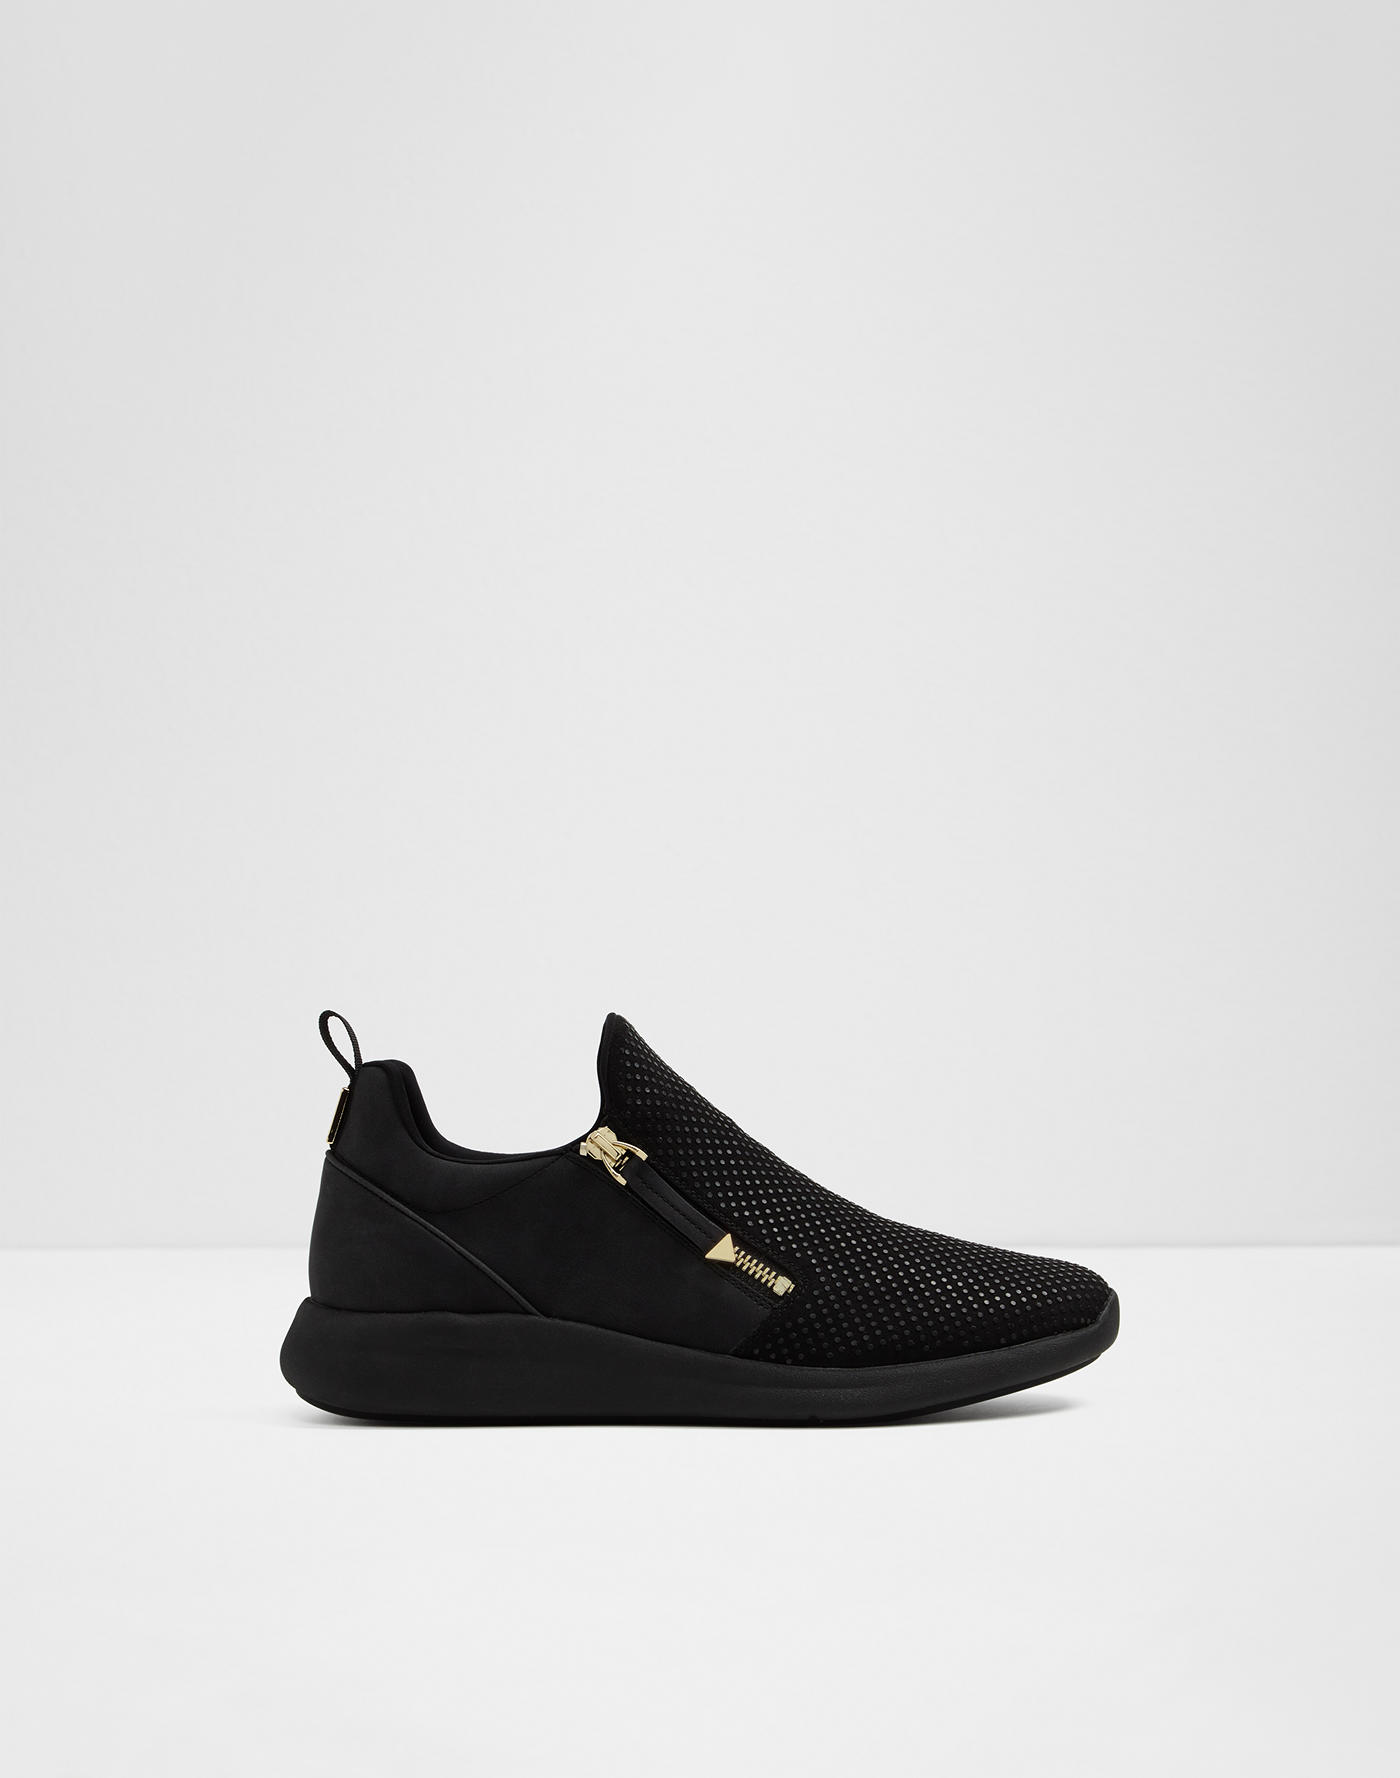 5e6b336384da Men's Sneakers & Tennis Shoes | Fashion Sneakers | ALDO US | Aldoshoes.com  US